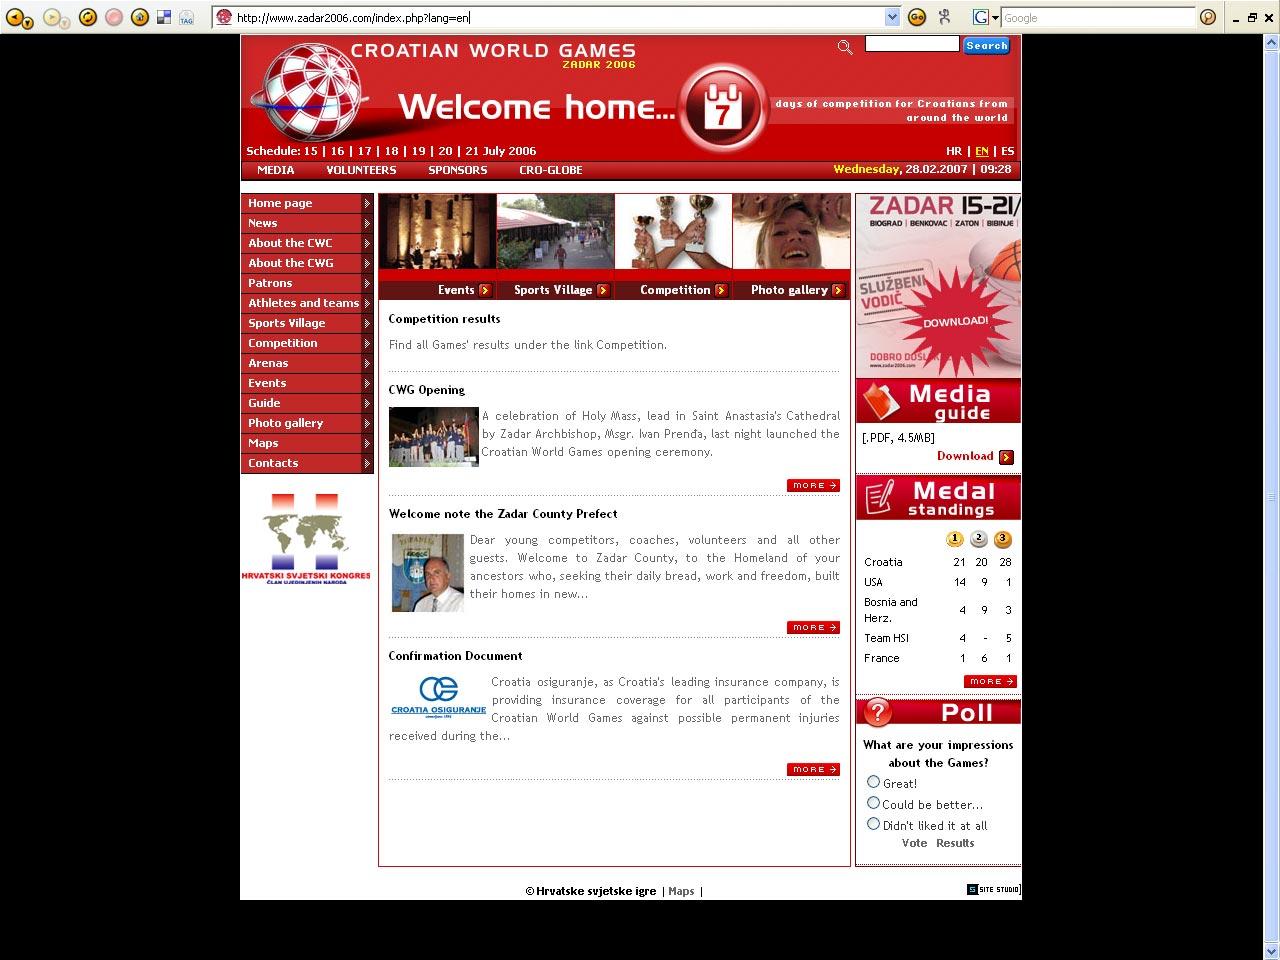 Croatian World Games website